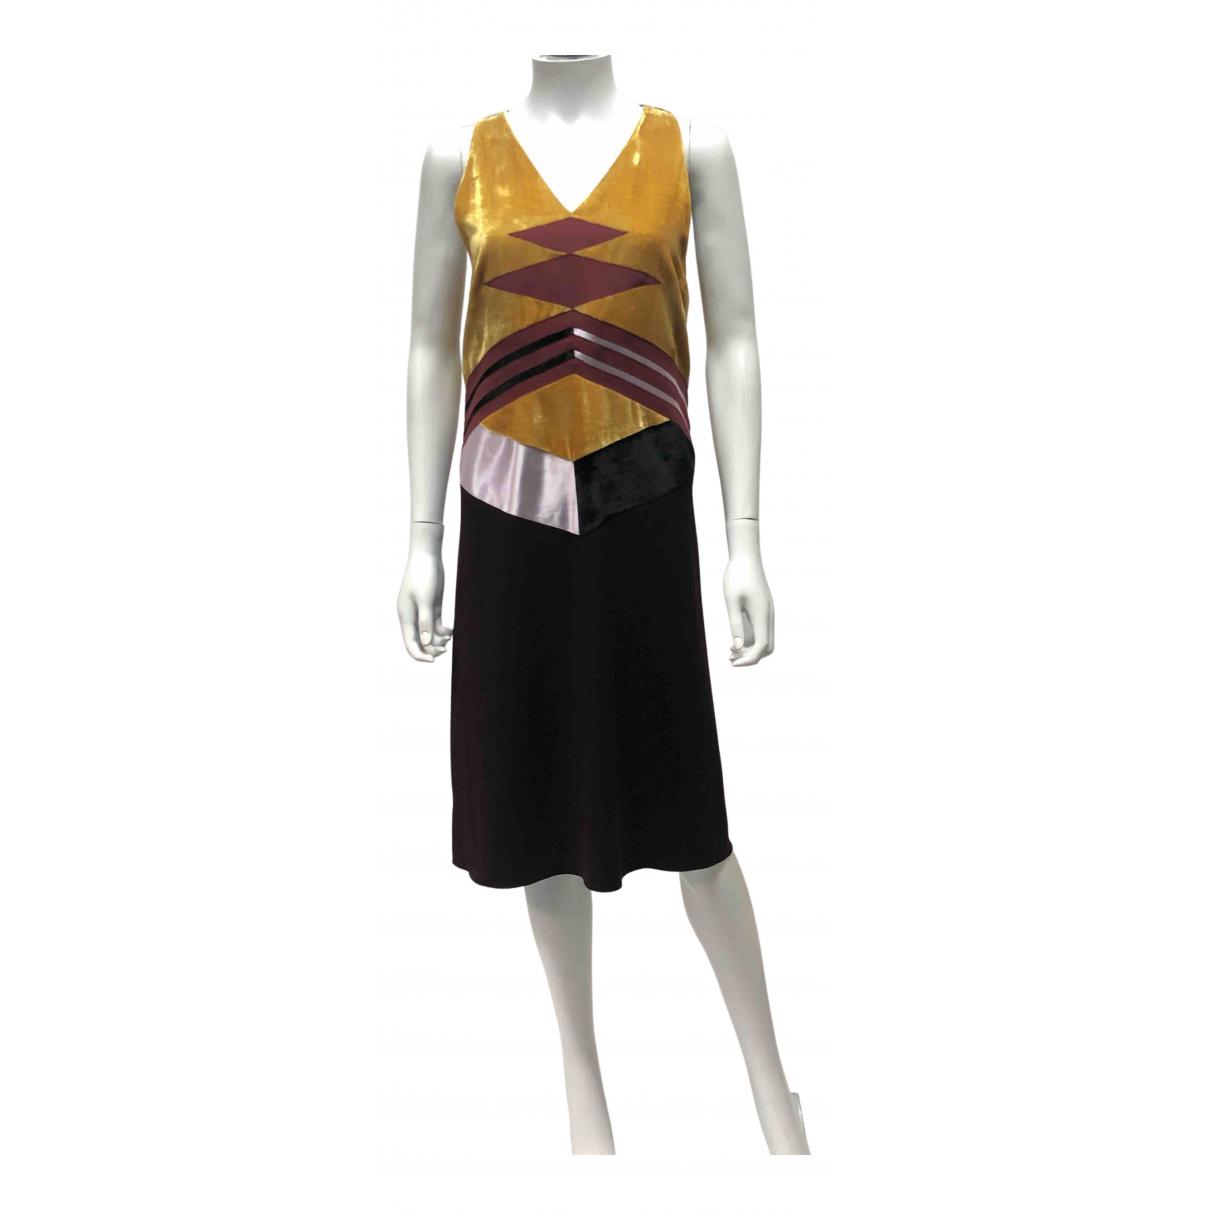 Bottega Veneta - Robe   pour femme en velours - multicolore